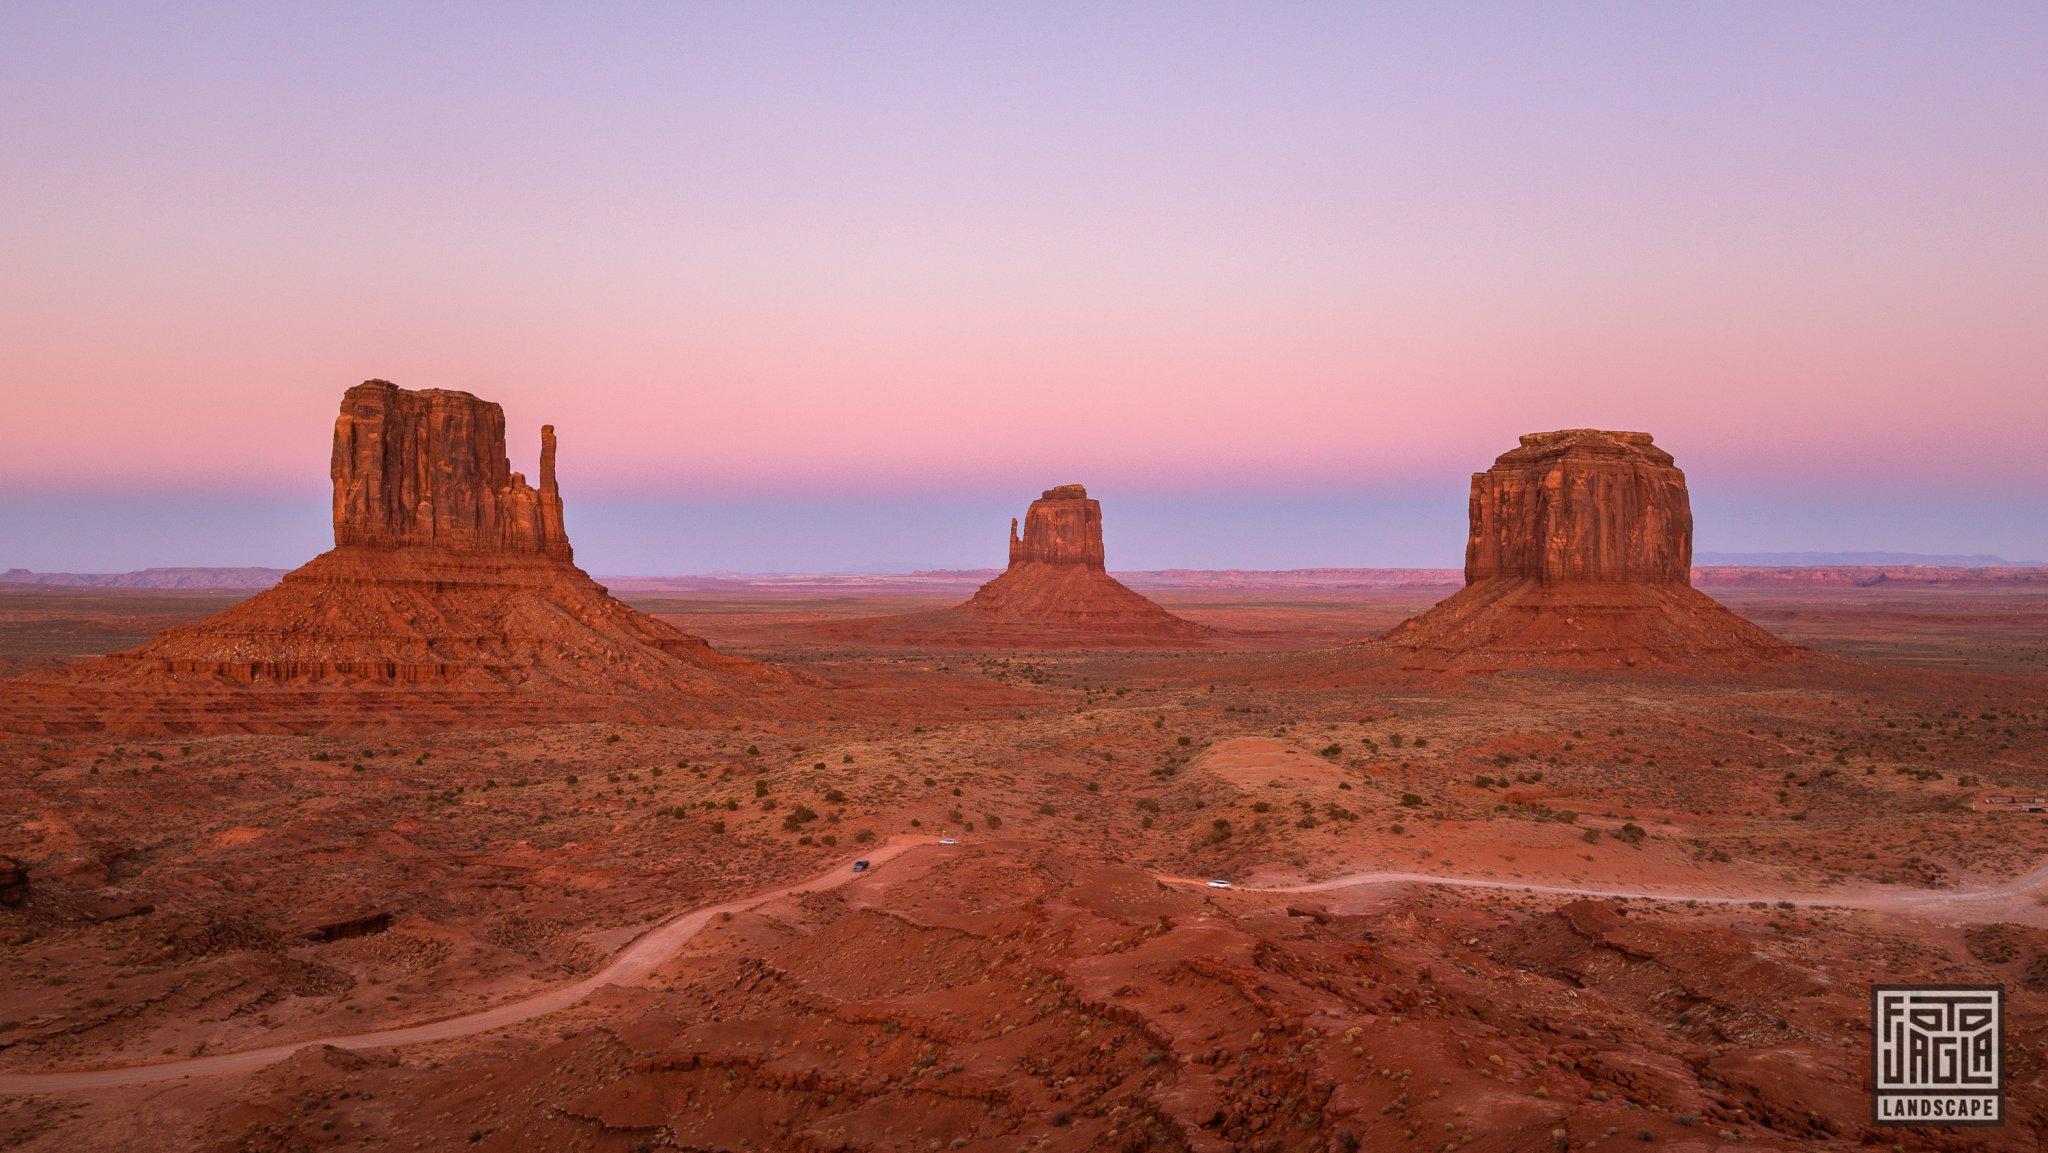 Beautiful sunset at Monument Valley Arizona, USA 2019